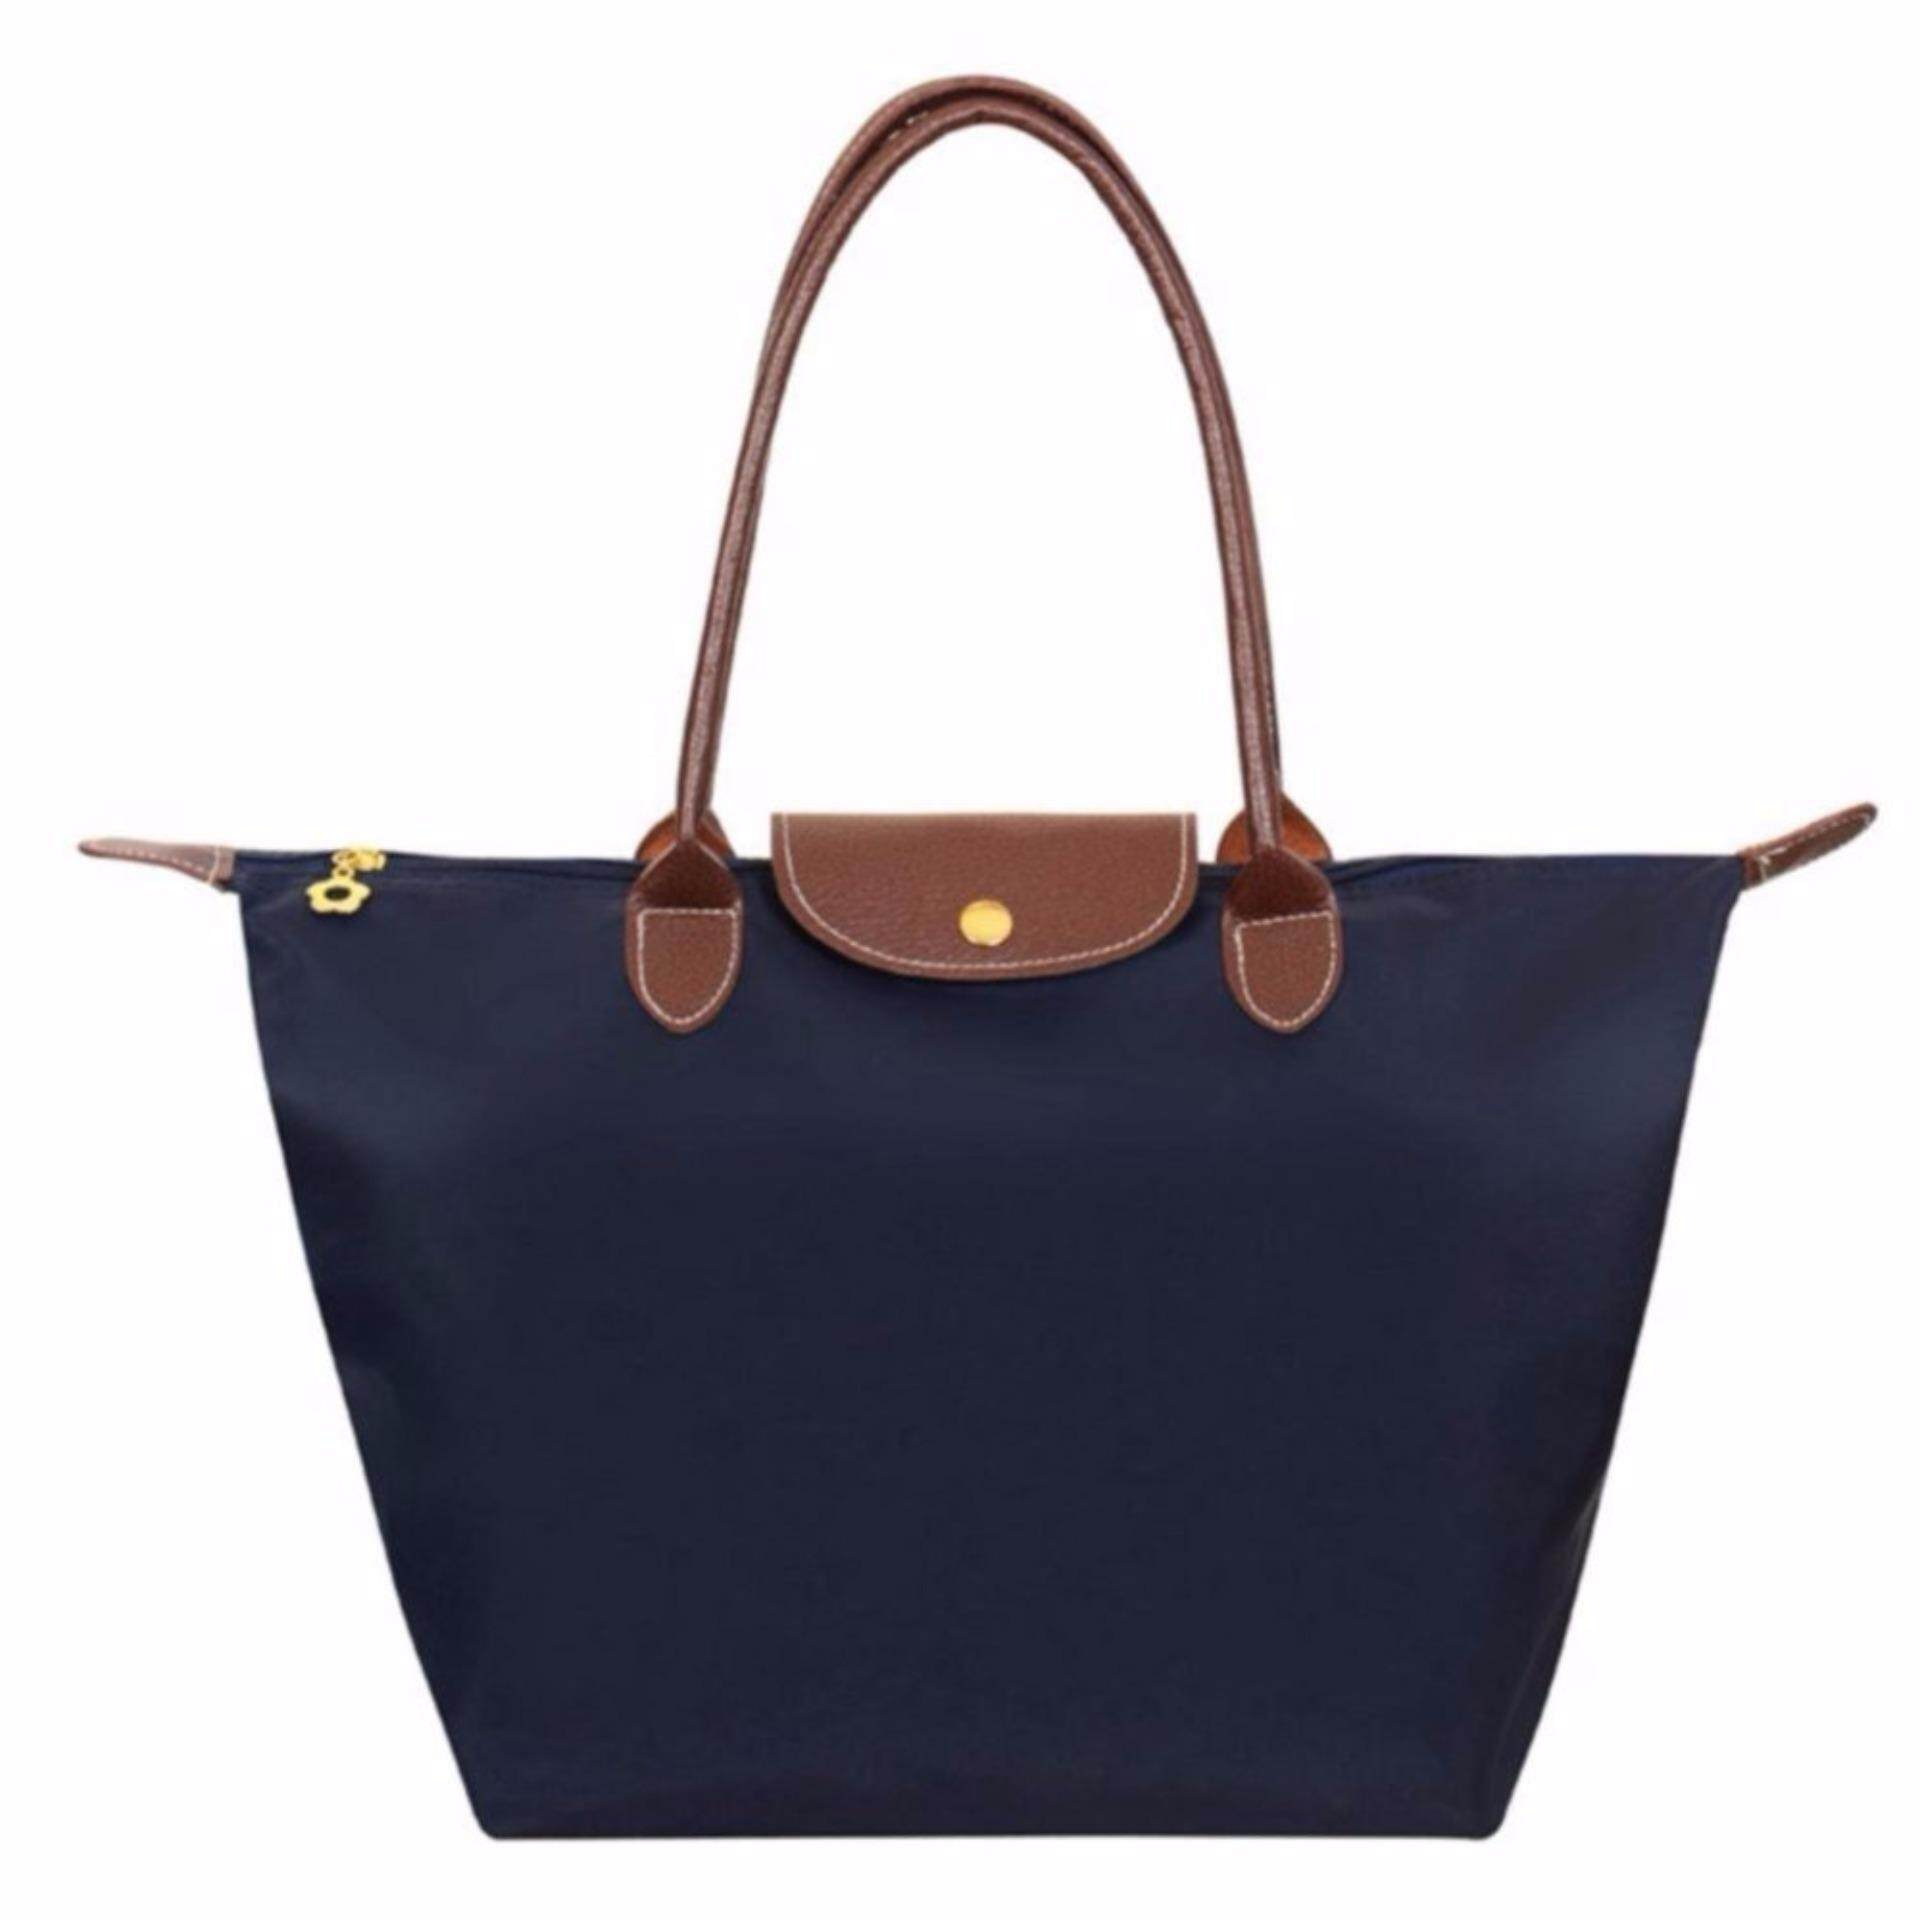 European Large Tote Bag Women Handbag Waterproof Foldable Dark Blue